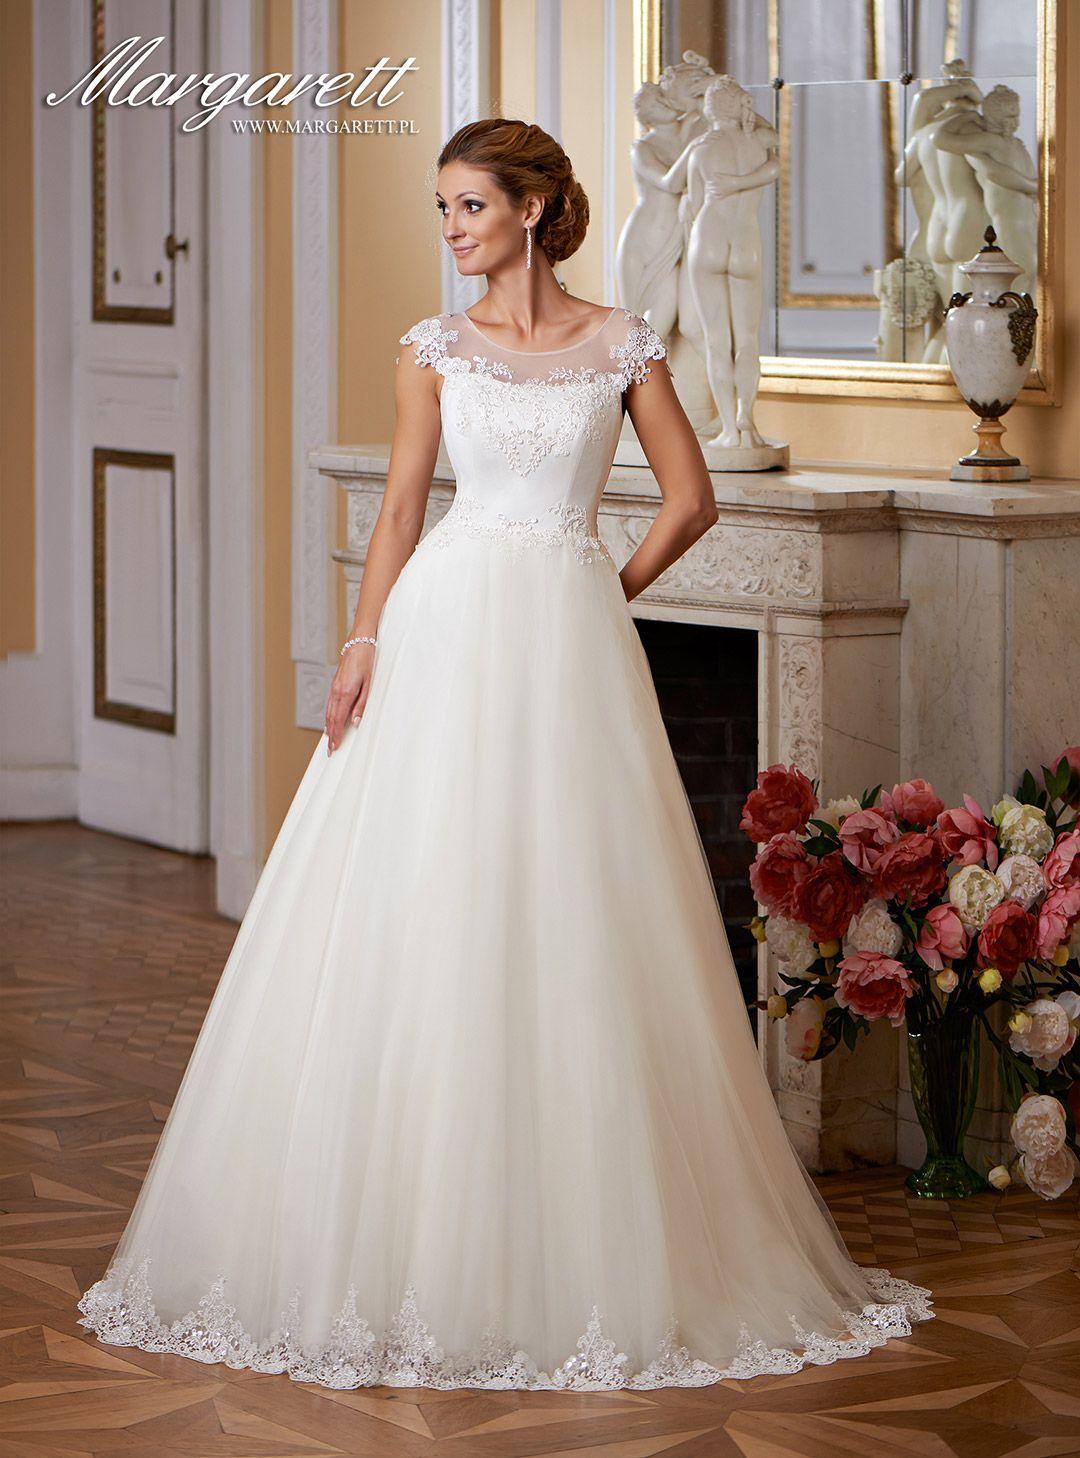 Suknie Slubne Suknia Slubna Suknie Slubne Fensi Pl Kolekcje Bridal Wear Wedding Dresses Lace Wedding Dresses